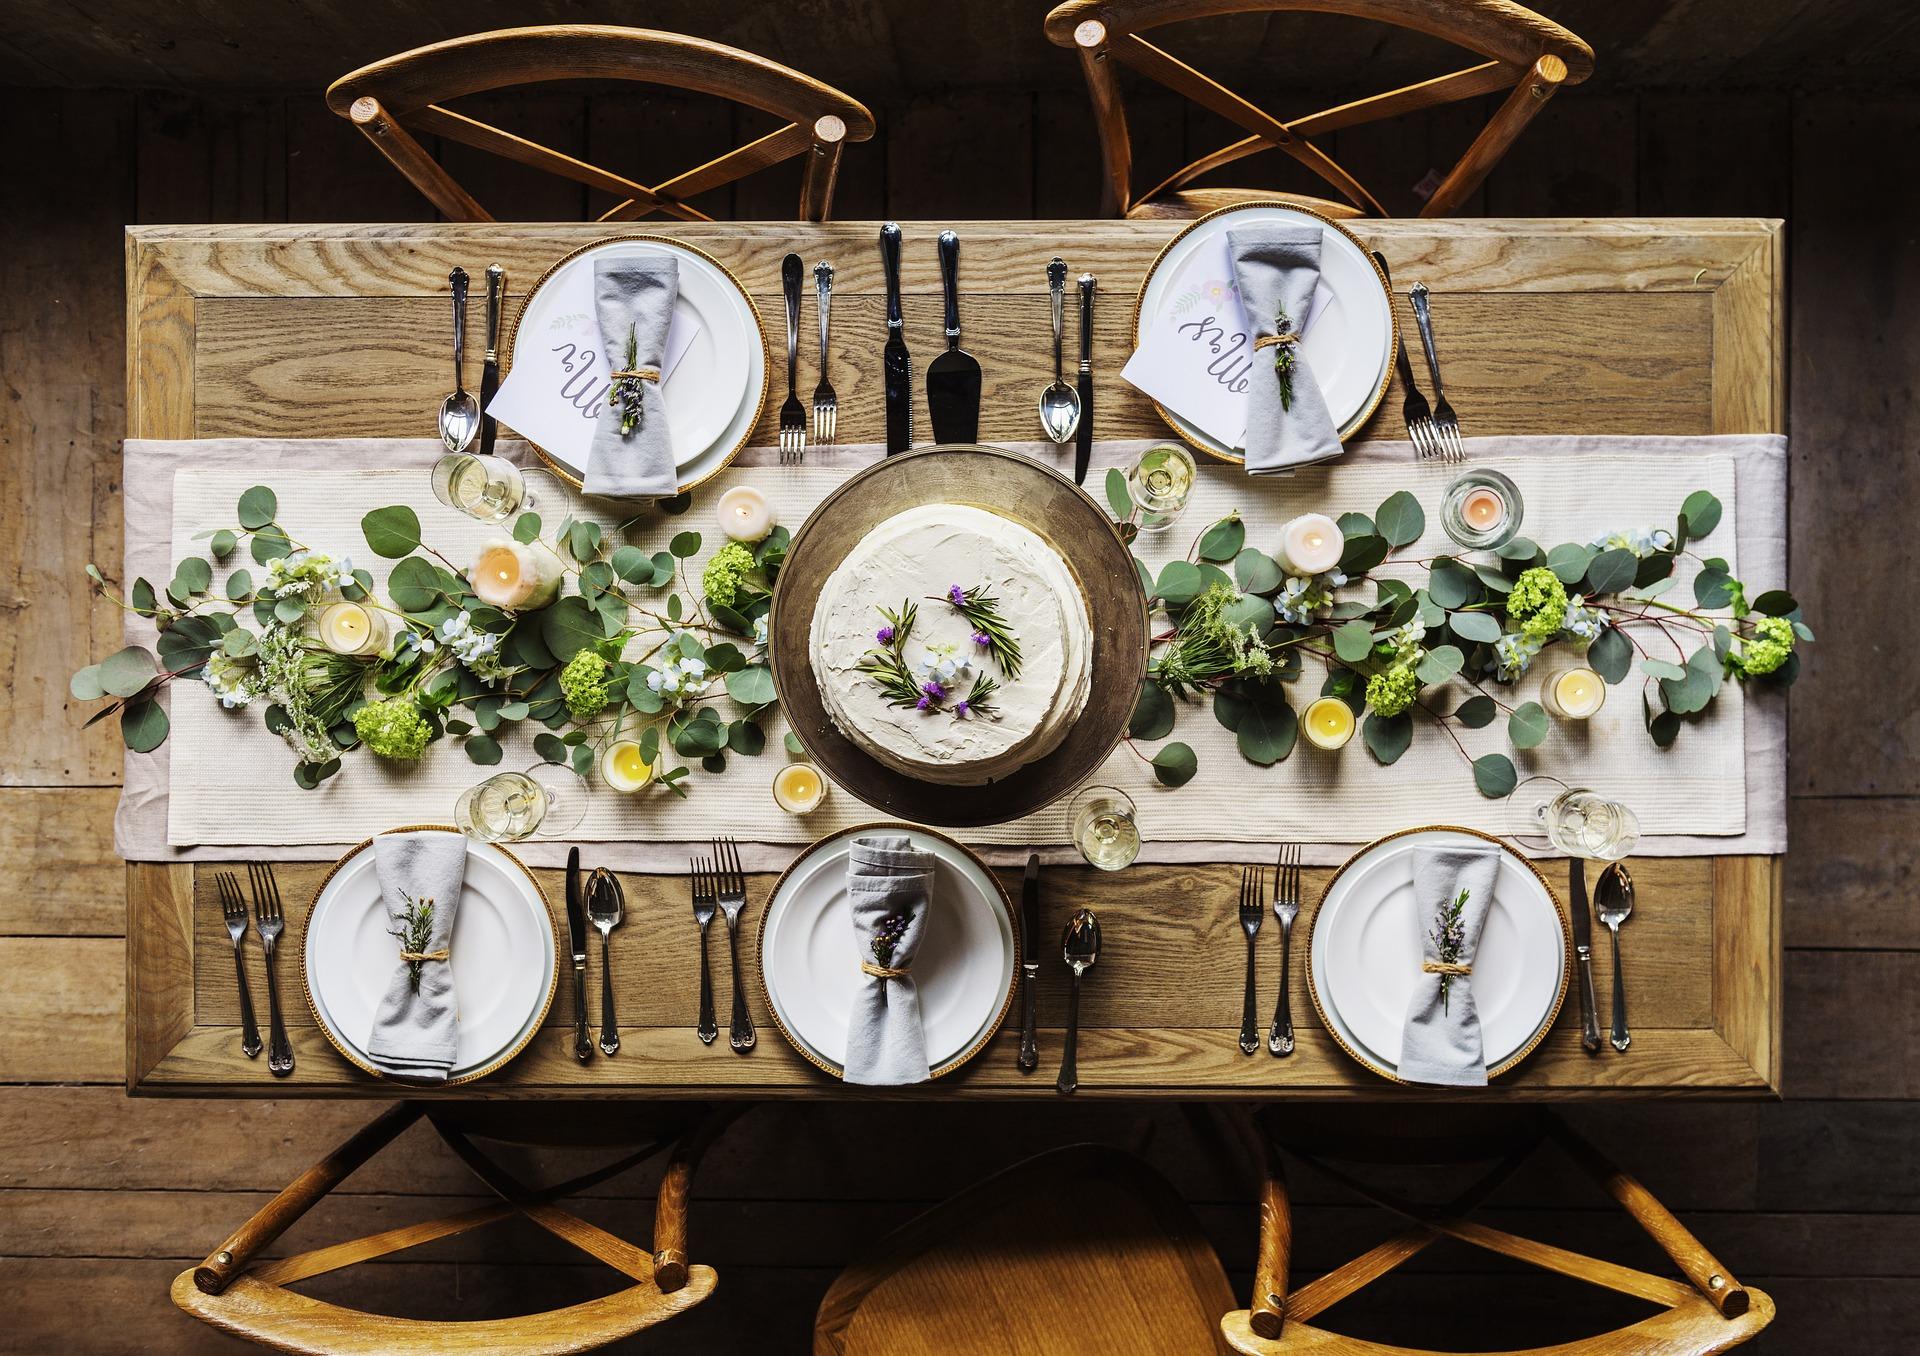 Table Decoration Ideas and Trends | Home Interior | Elle Blonde Luxury Lifestyle Destination Blog